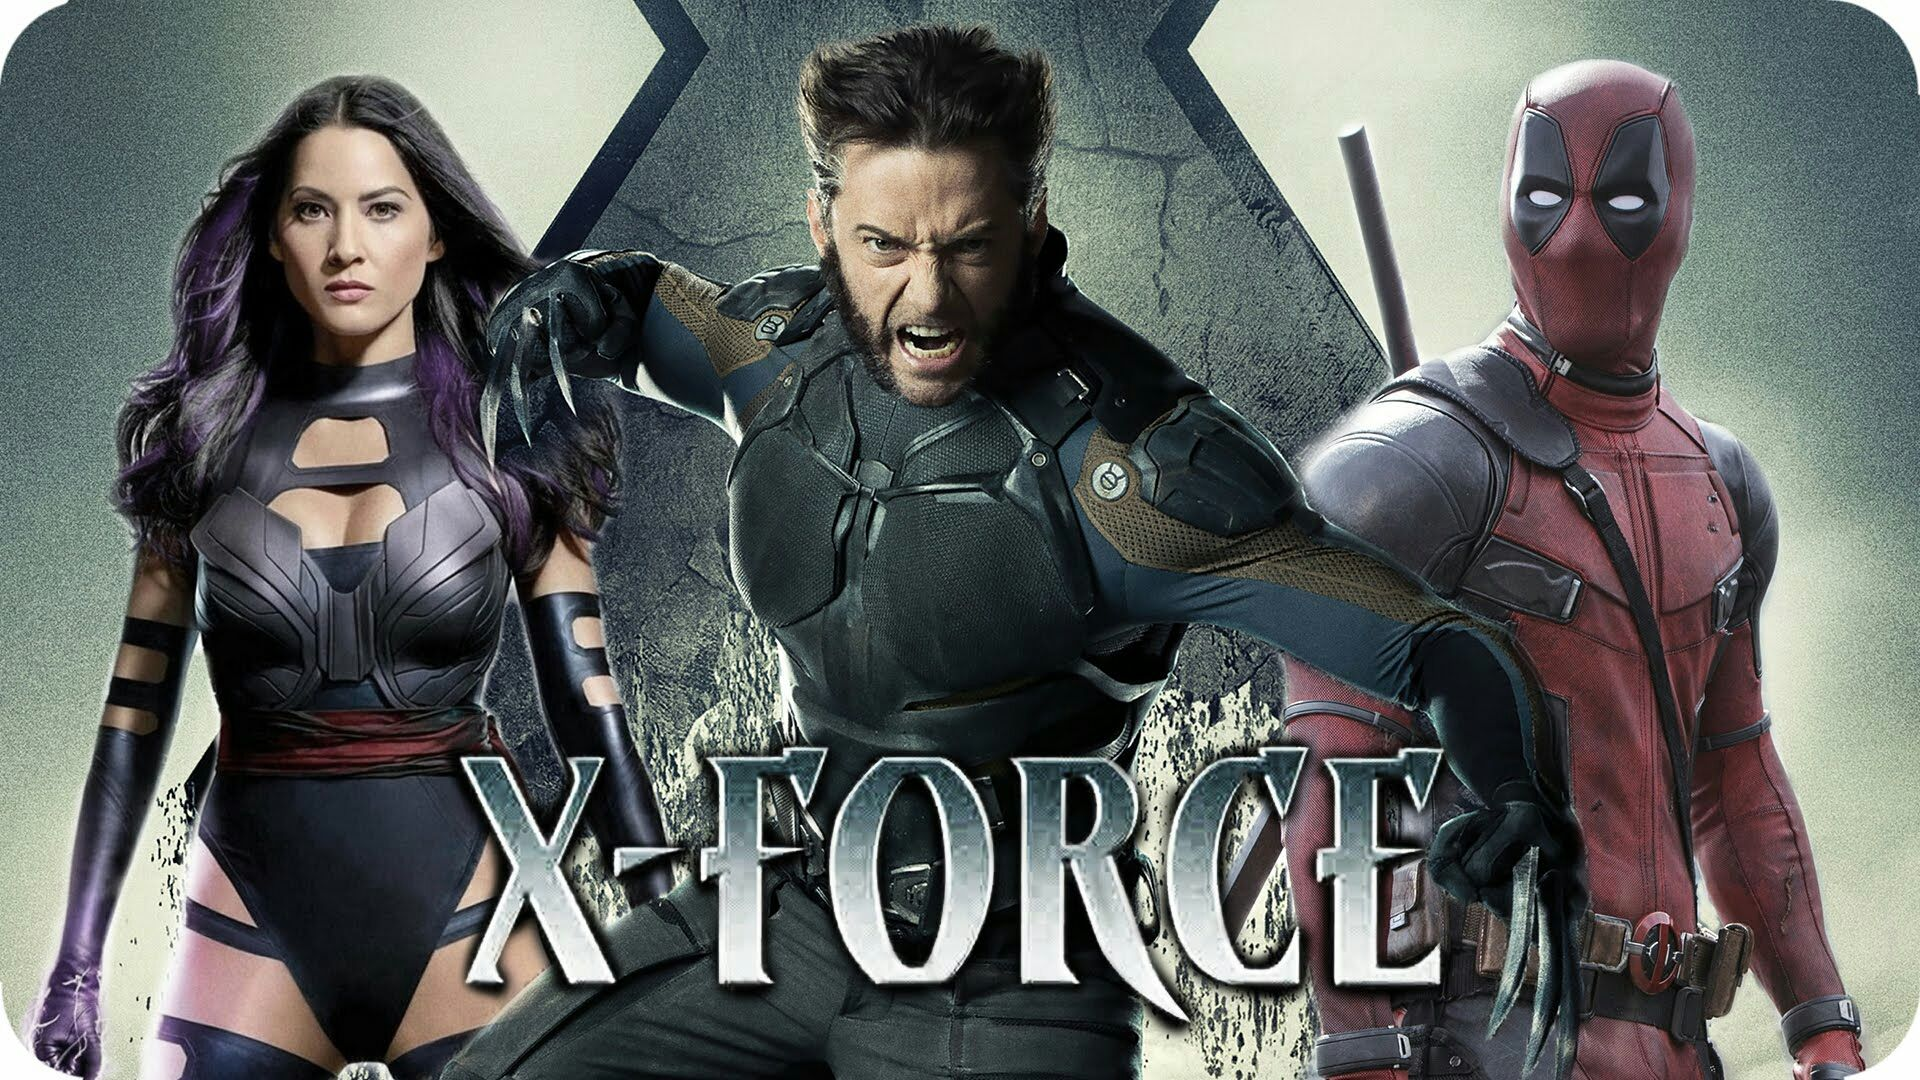 Watch X Force Movie Preview 2018 Deadpool X Men Team Up On Blacknerdslive Https Www Youtu Latest Hollywood Movies New Hollywood Movies Movie Previews